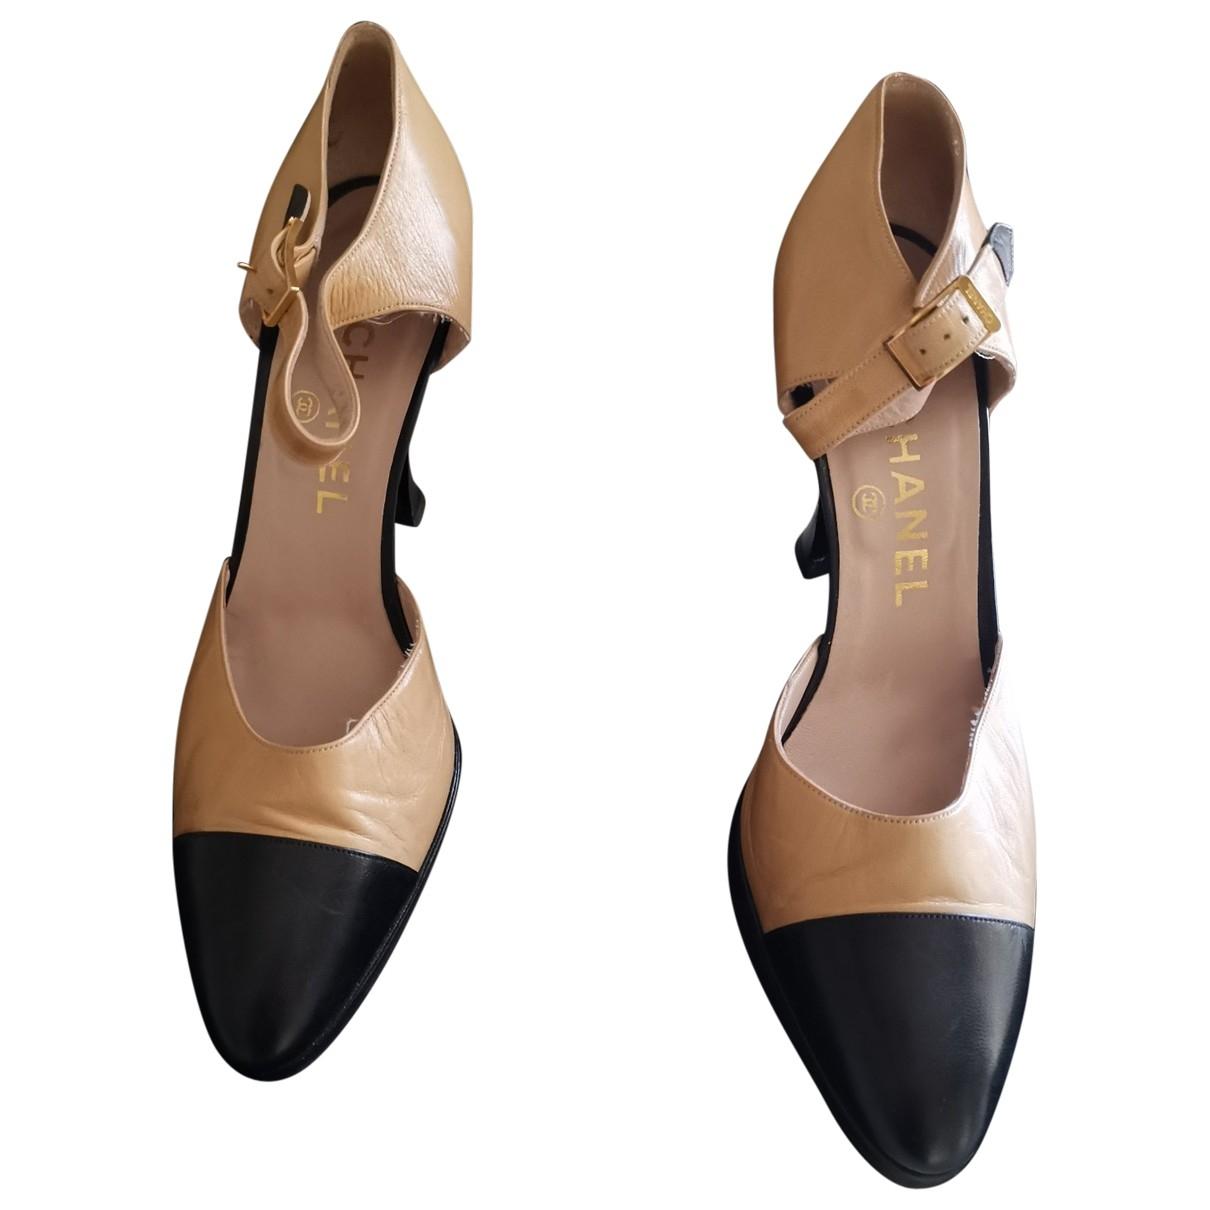 Chanel \N Multicolour Leather Heels for Women 38 EU